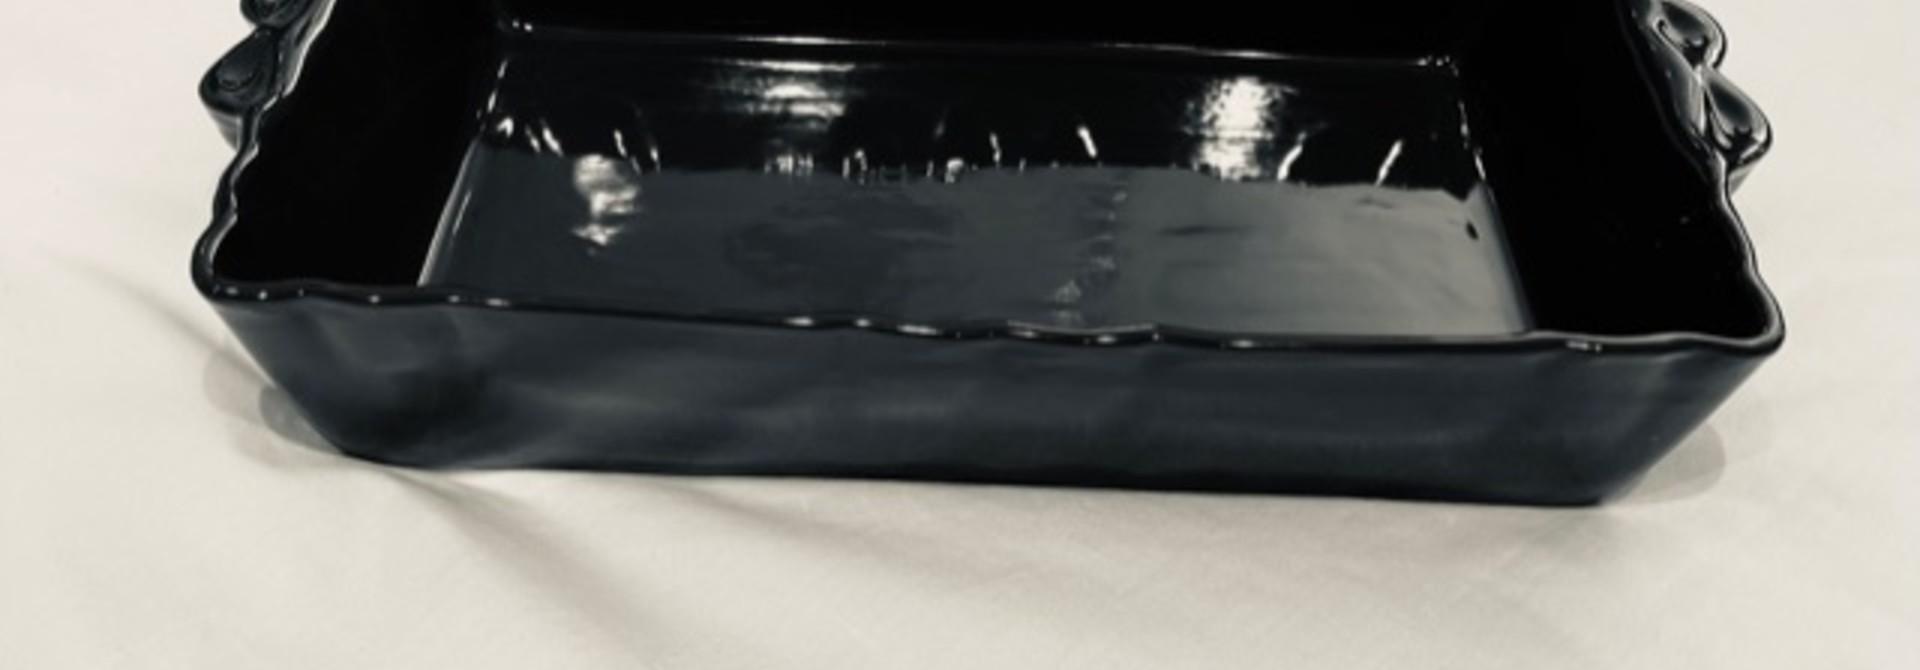 Feston Oven Dish - Dk Grey